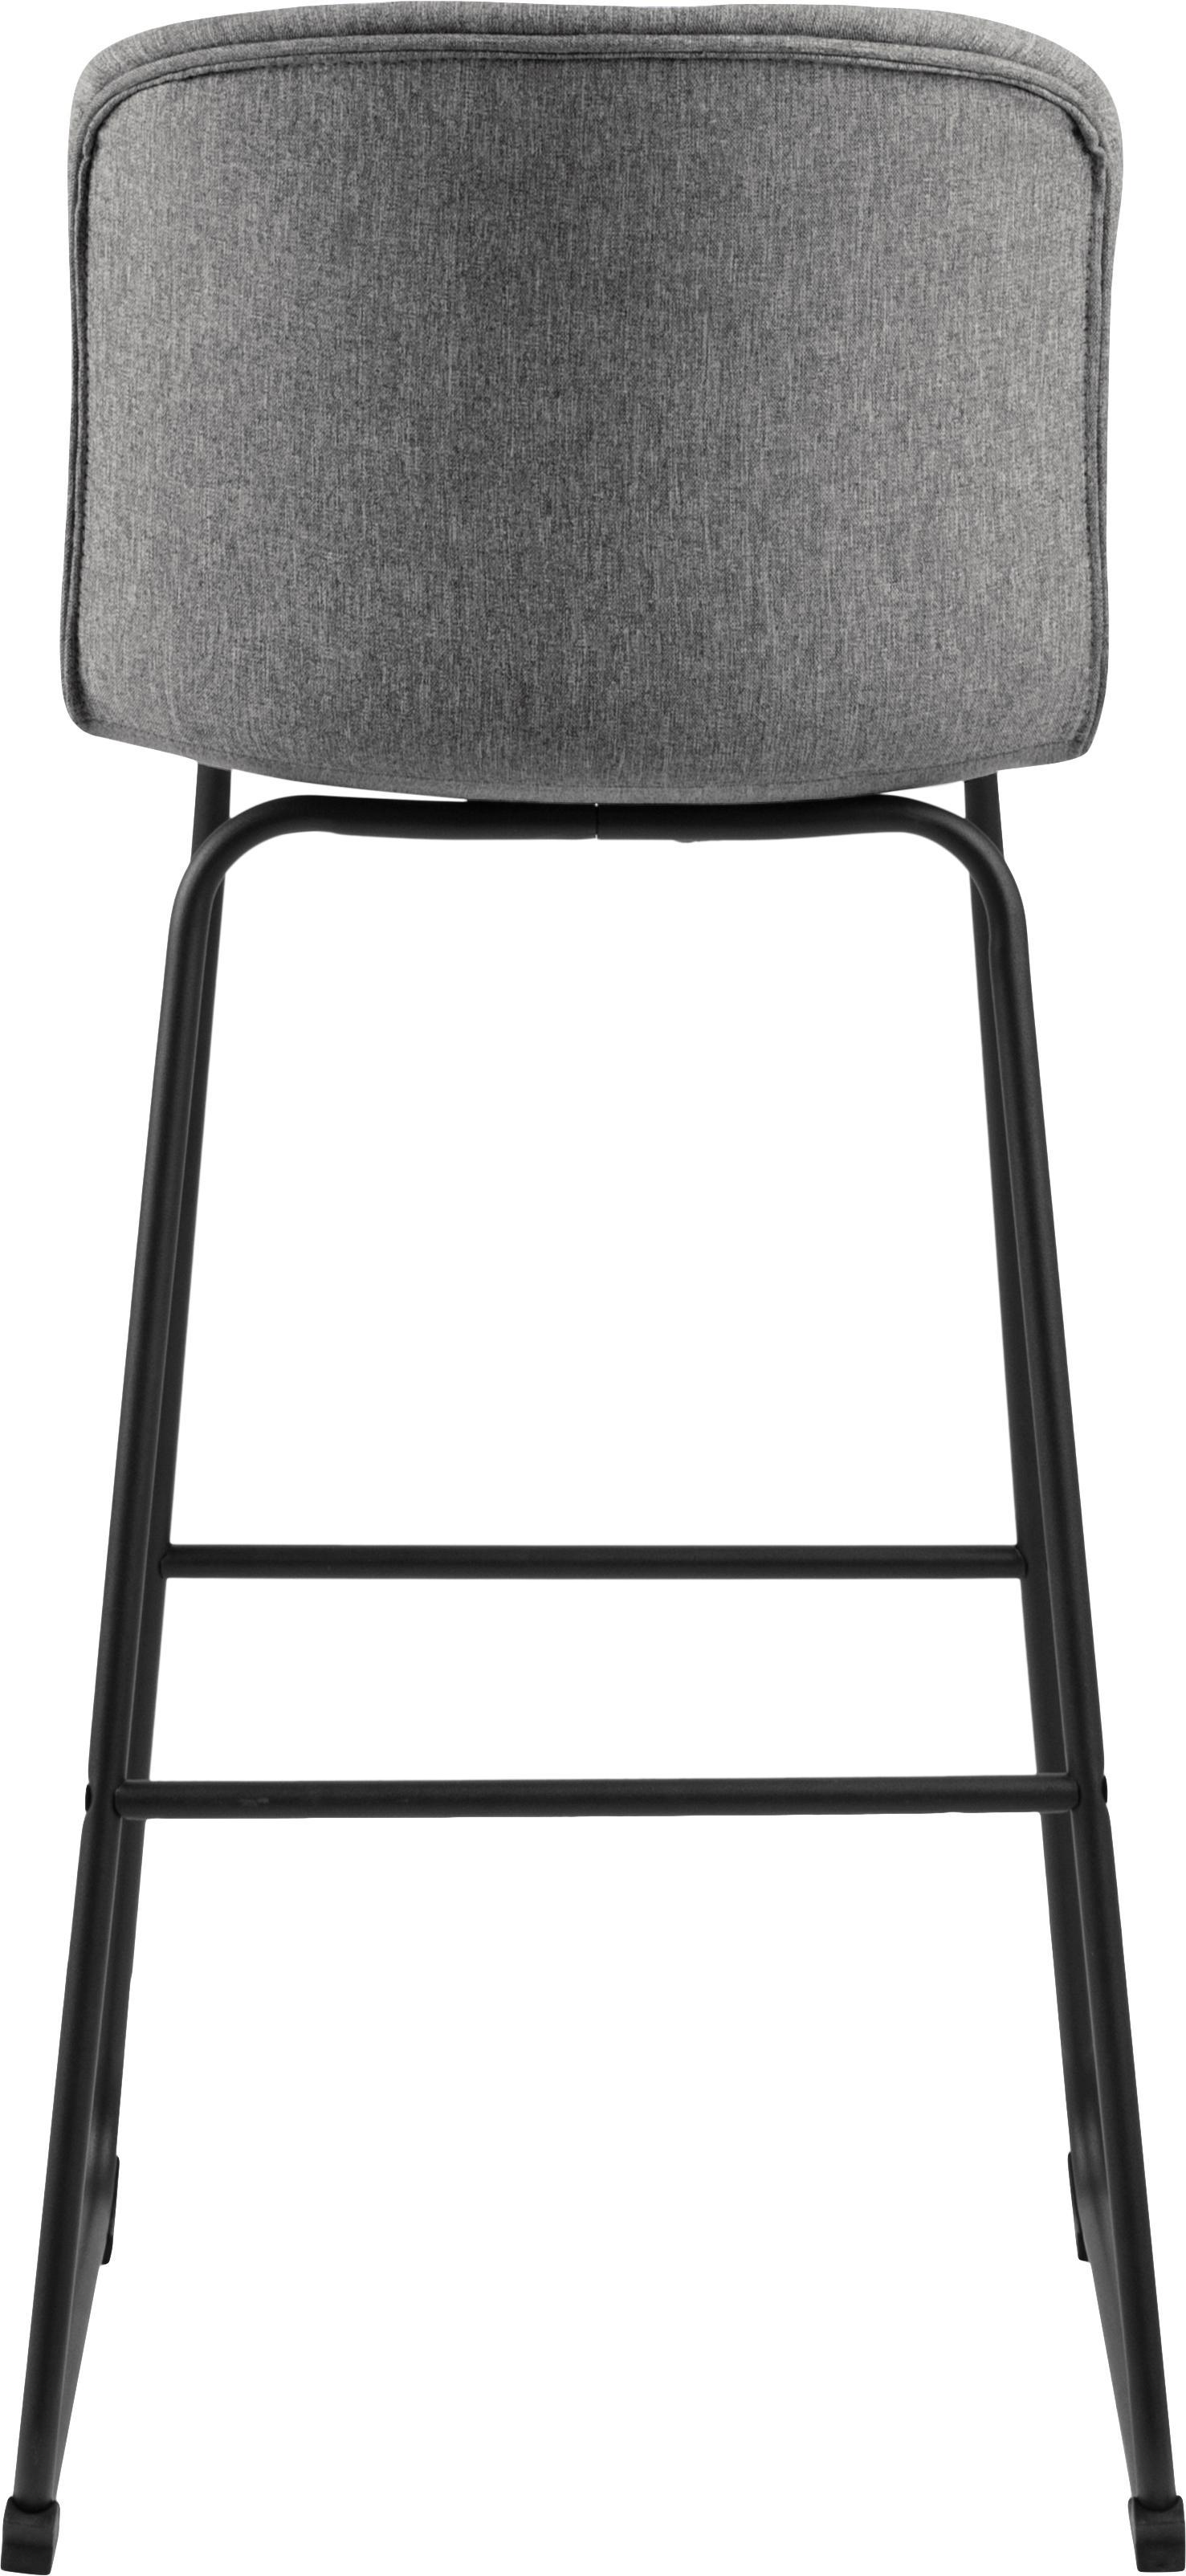 Barstühle Story, 2 Stück, Bezug: Polyester, Gestell: Metall, pulverbeschichtet, Grau, Schwarz, B 50 x T 55 cm